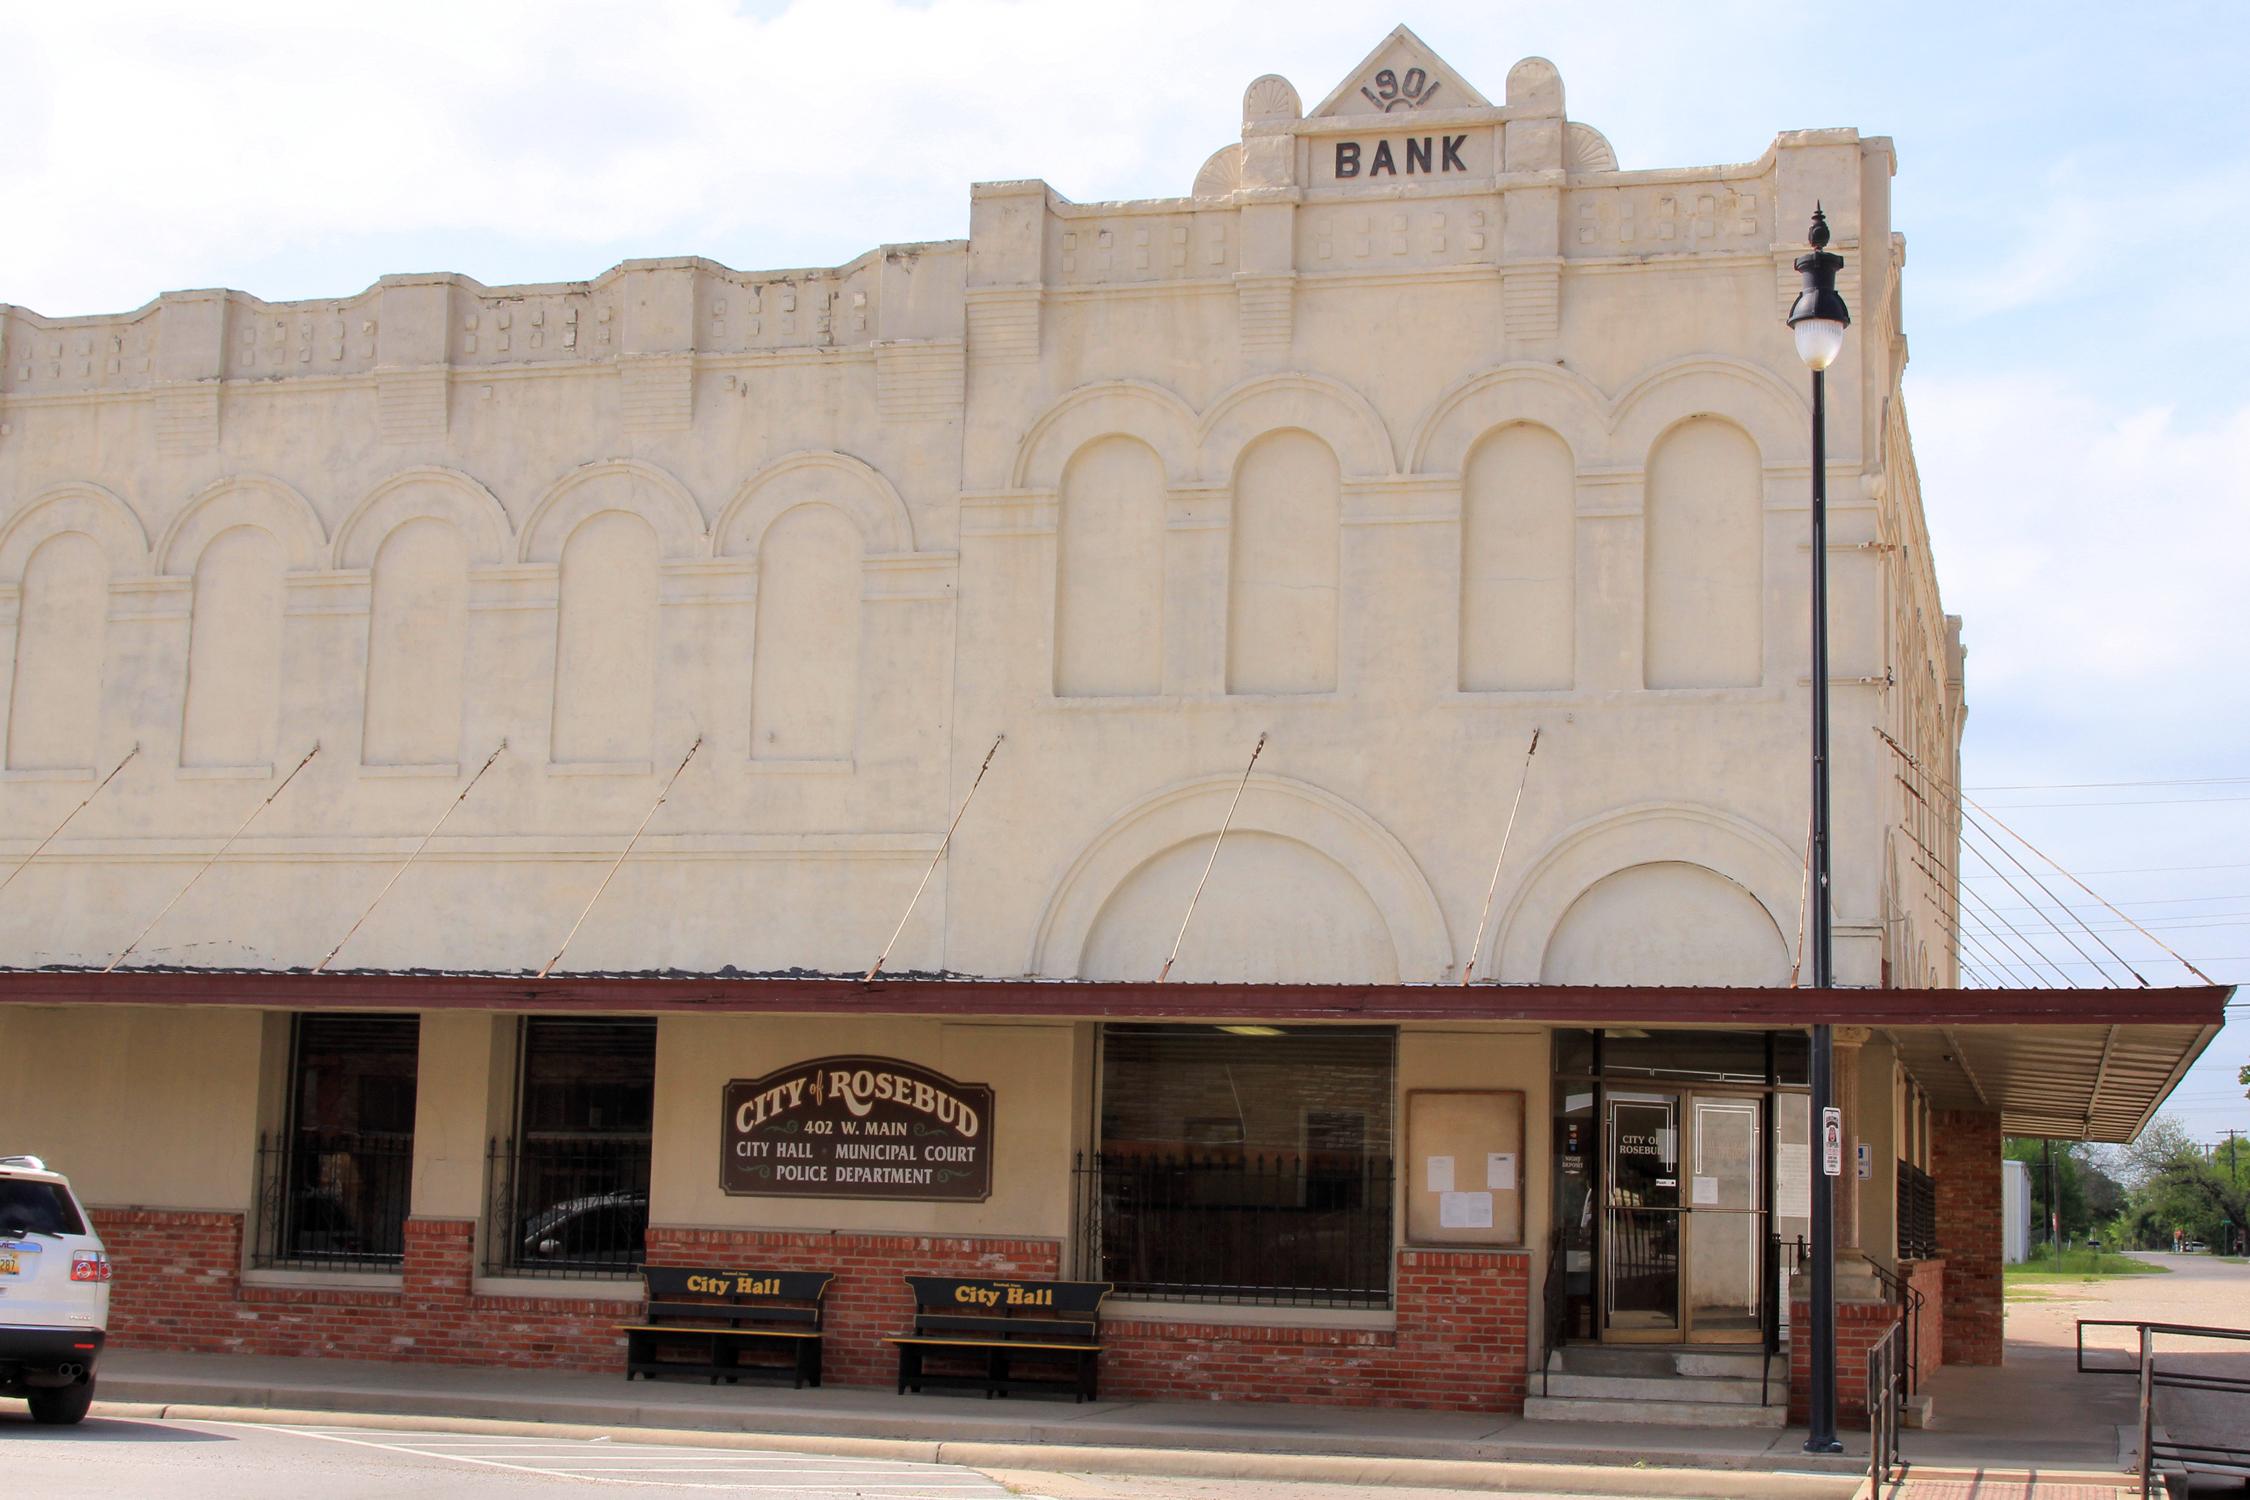 Rosebud (Texas)